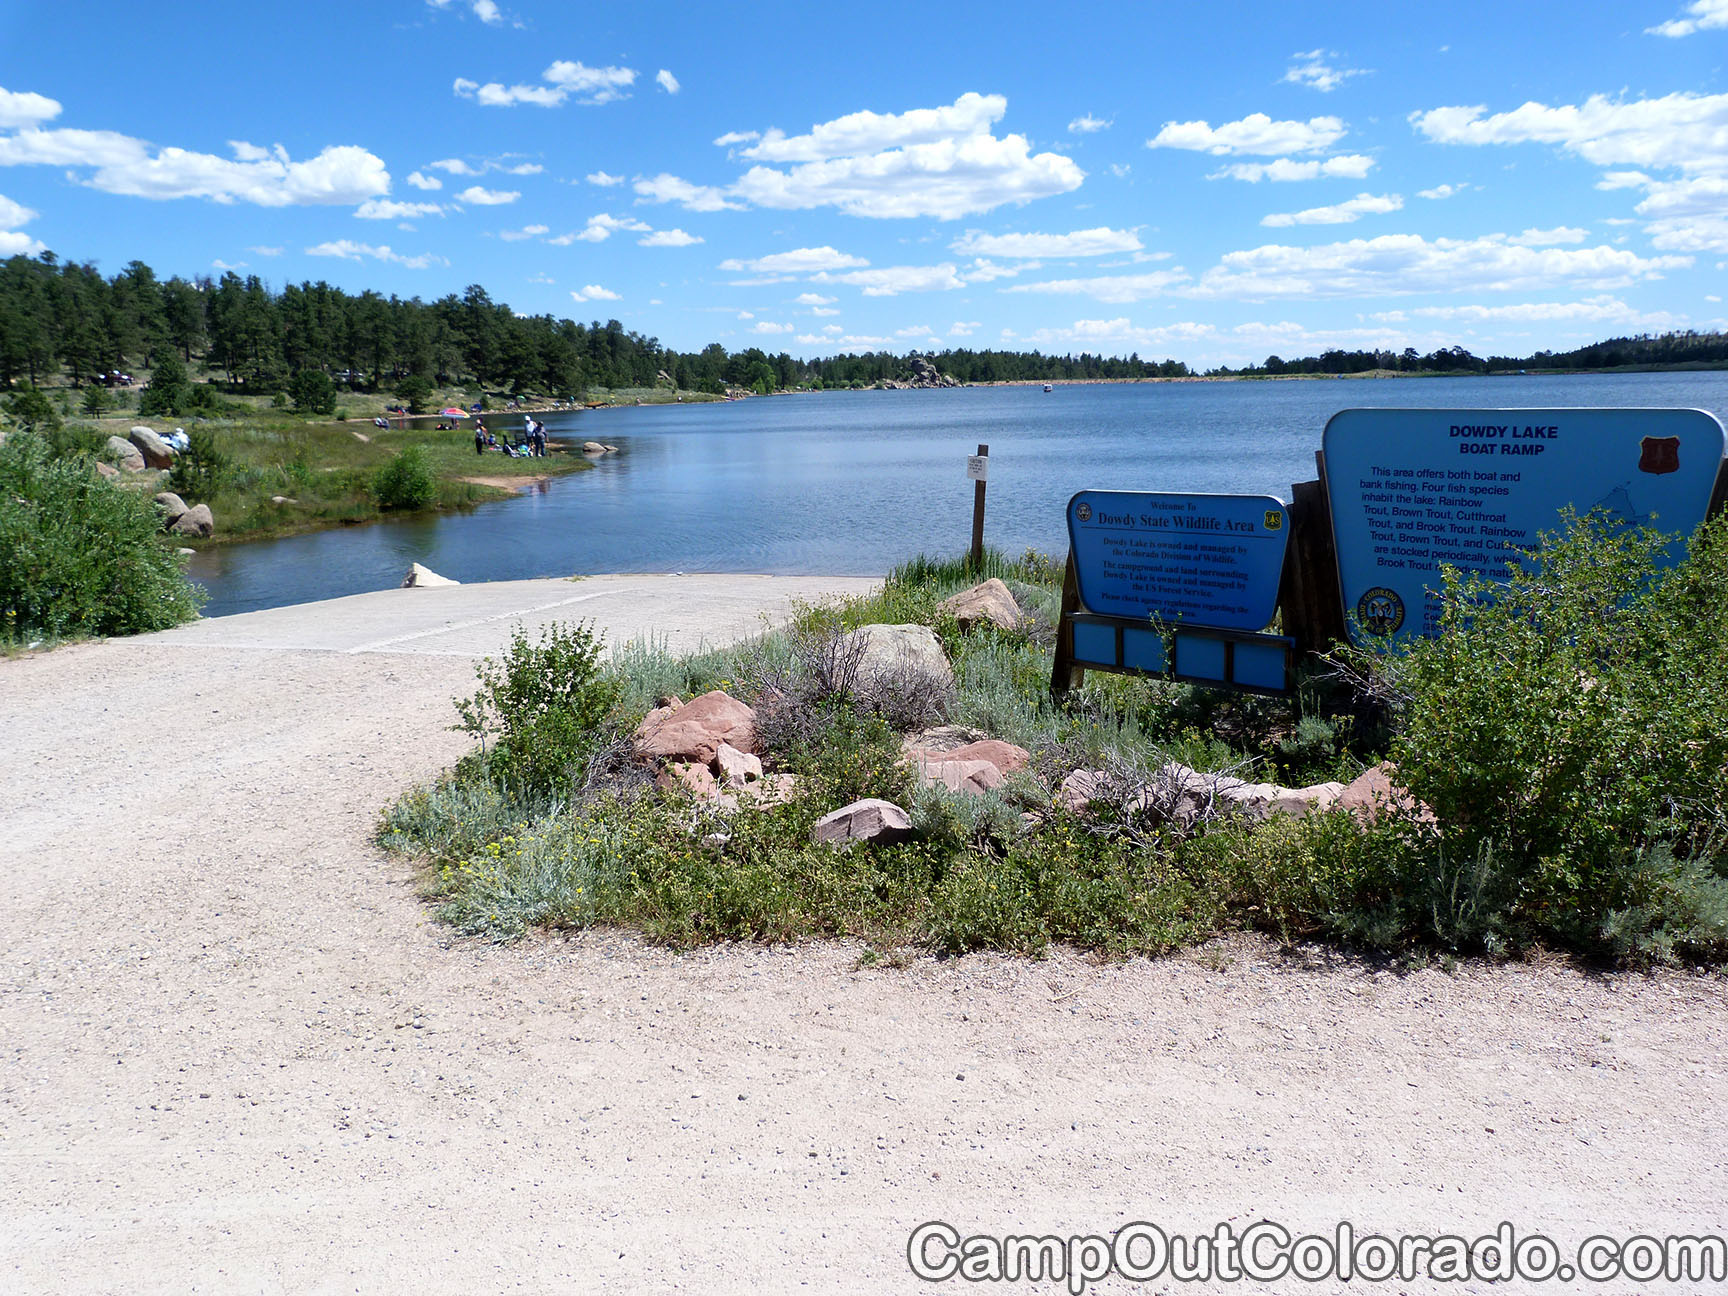 Campoutcolorado-dowdy-lake-campground-boat-dock